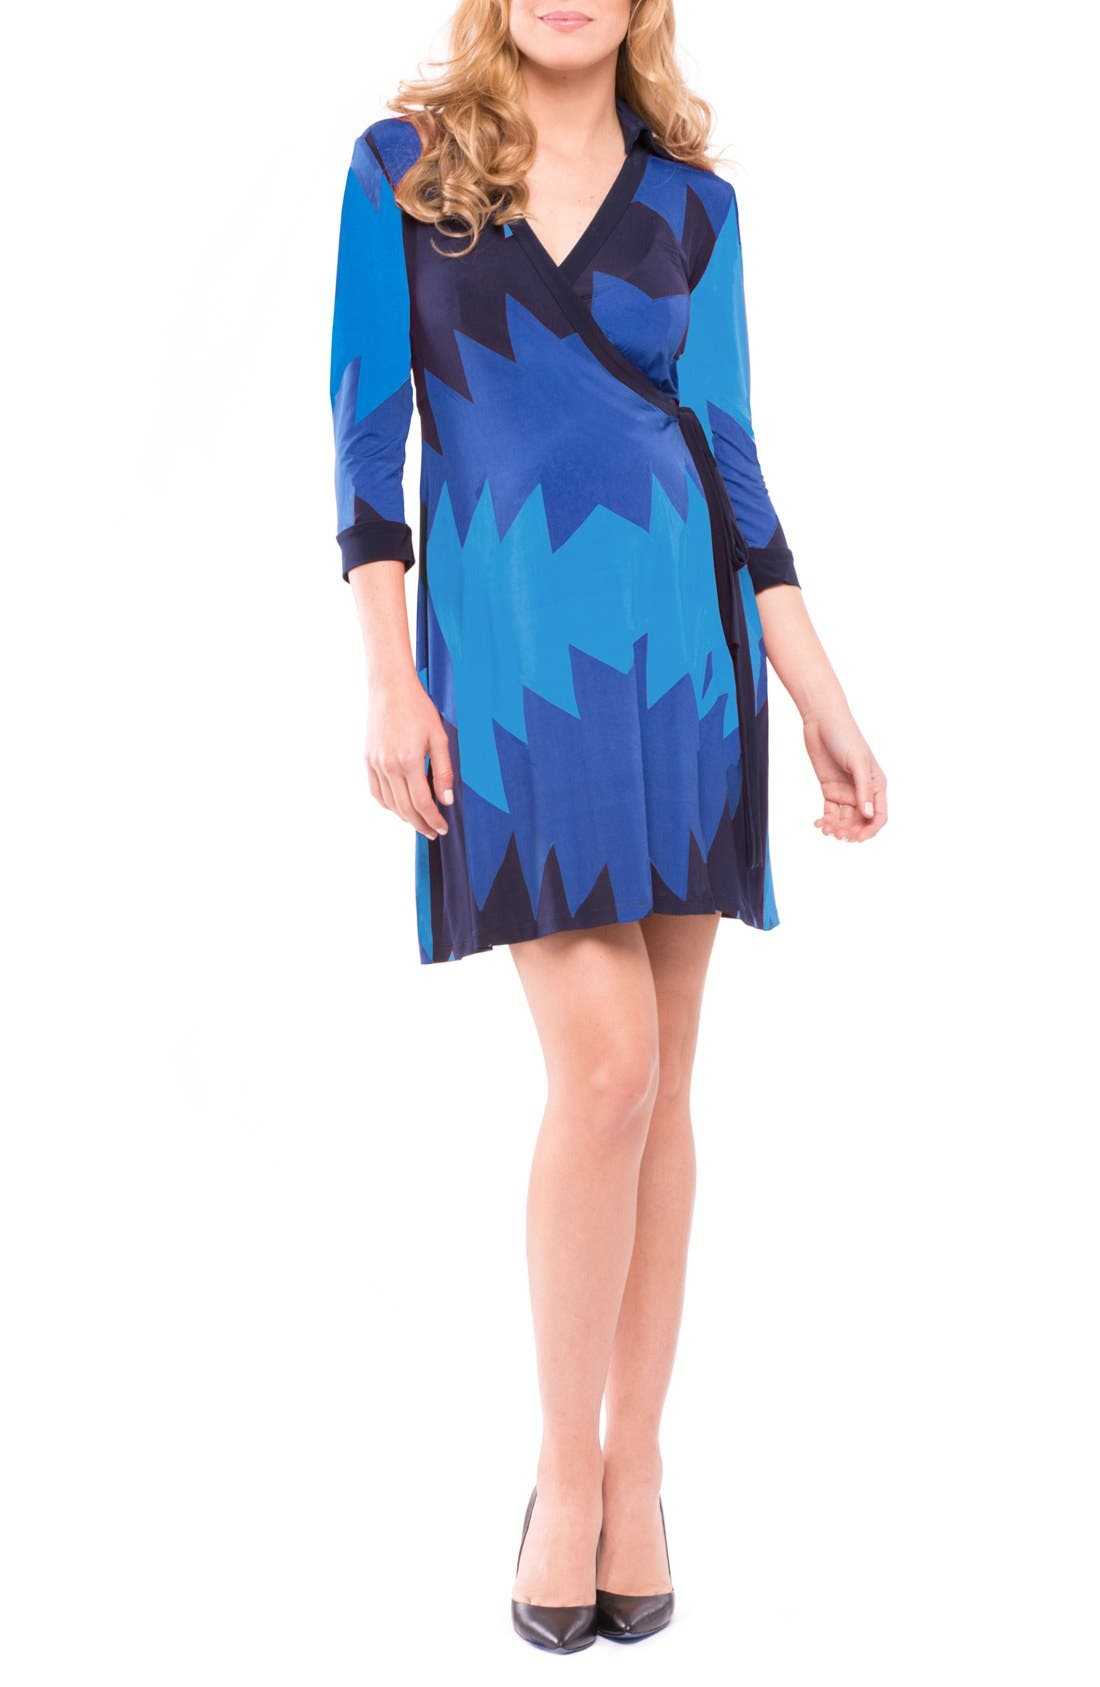 Olivia Maternity Wrap Dress,                             Main thumbnail 1, color,                             BLUE AZTEC PRINT